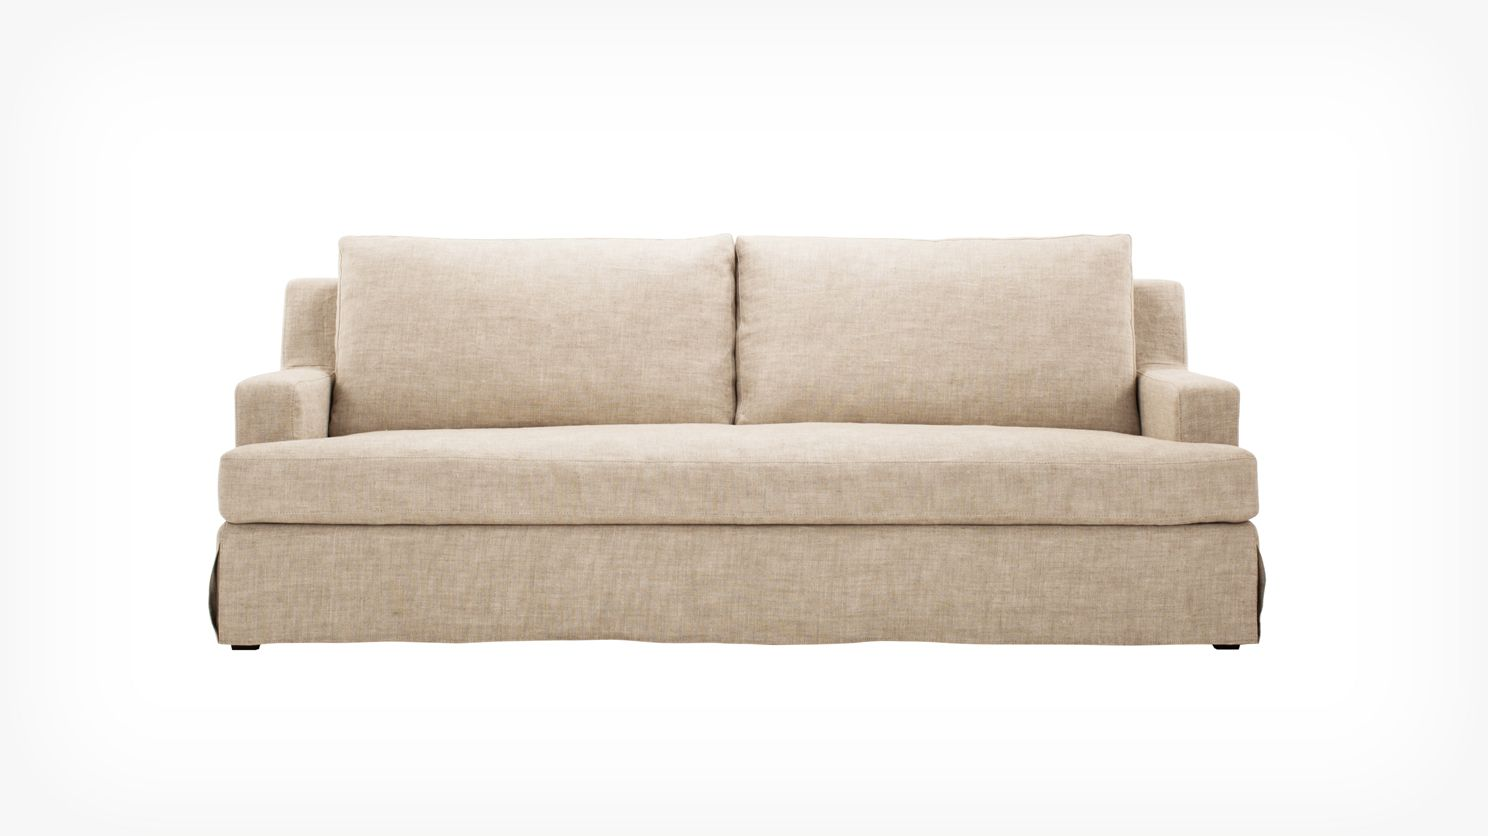 Blanche slipcover sofa eq3 modern furniture